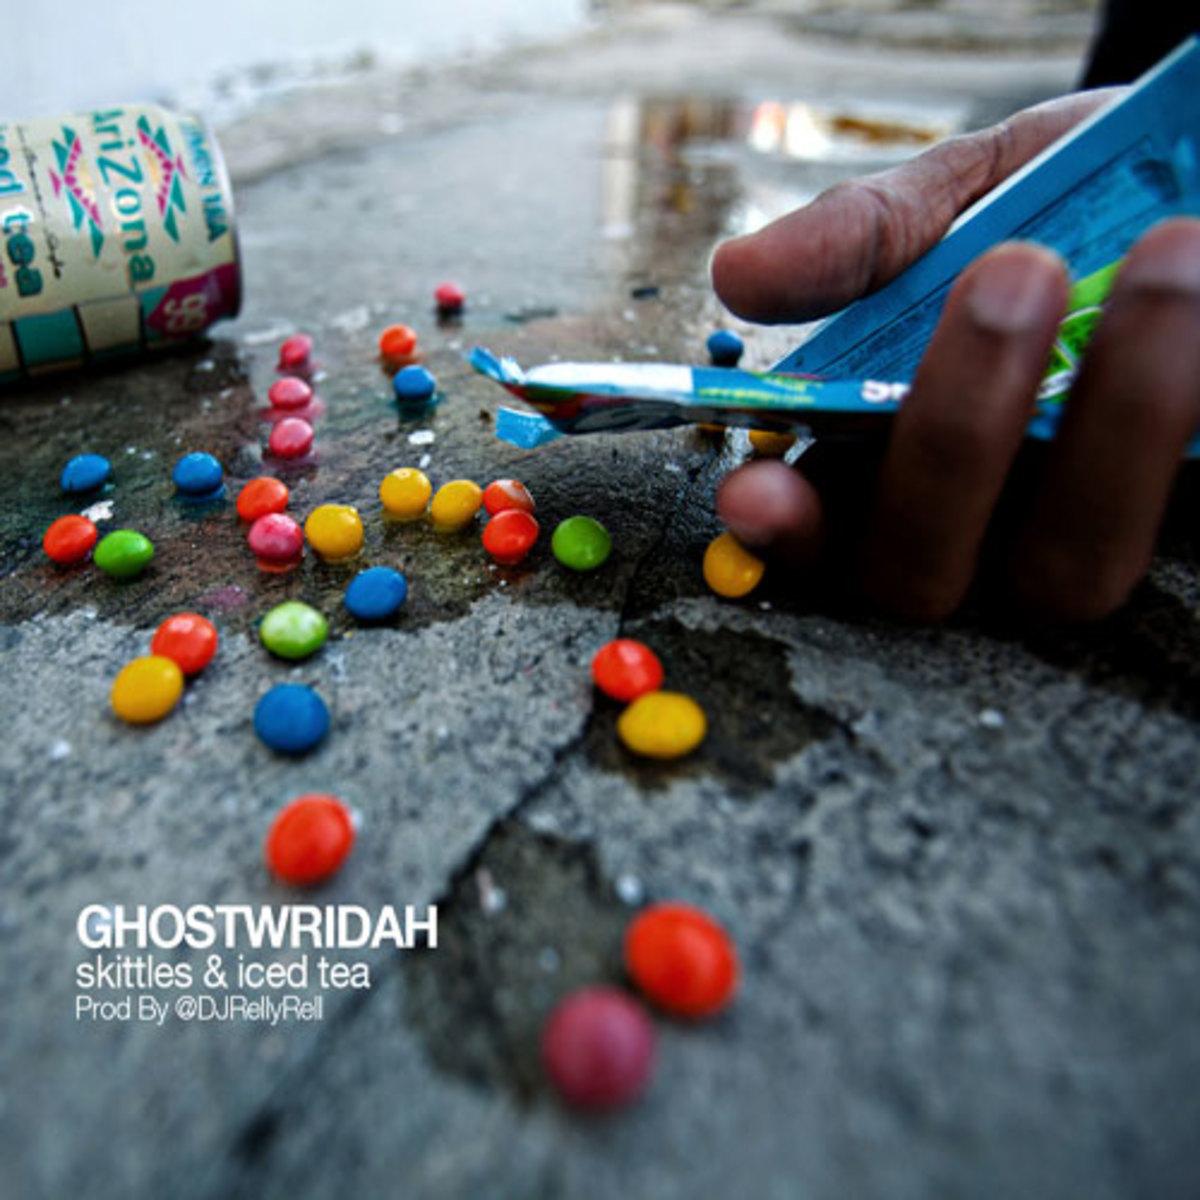 ghostwridah-skittlesicedtea.jpg